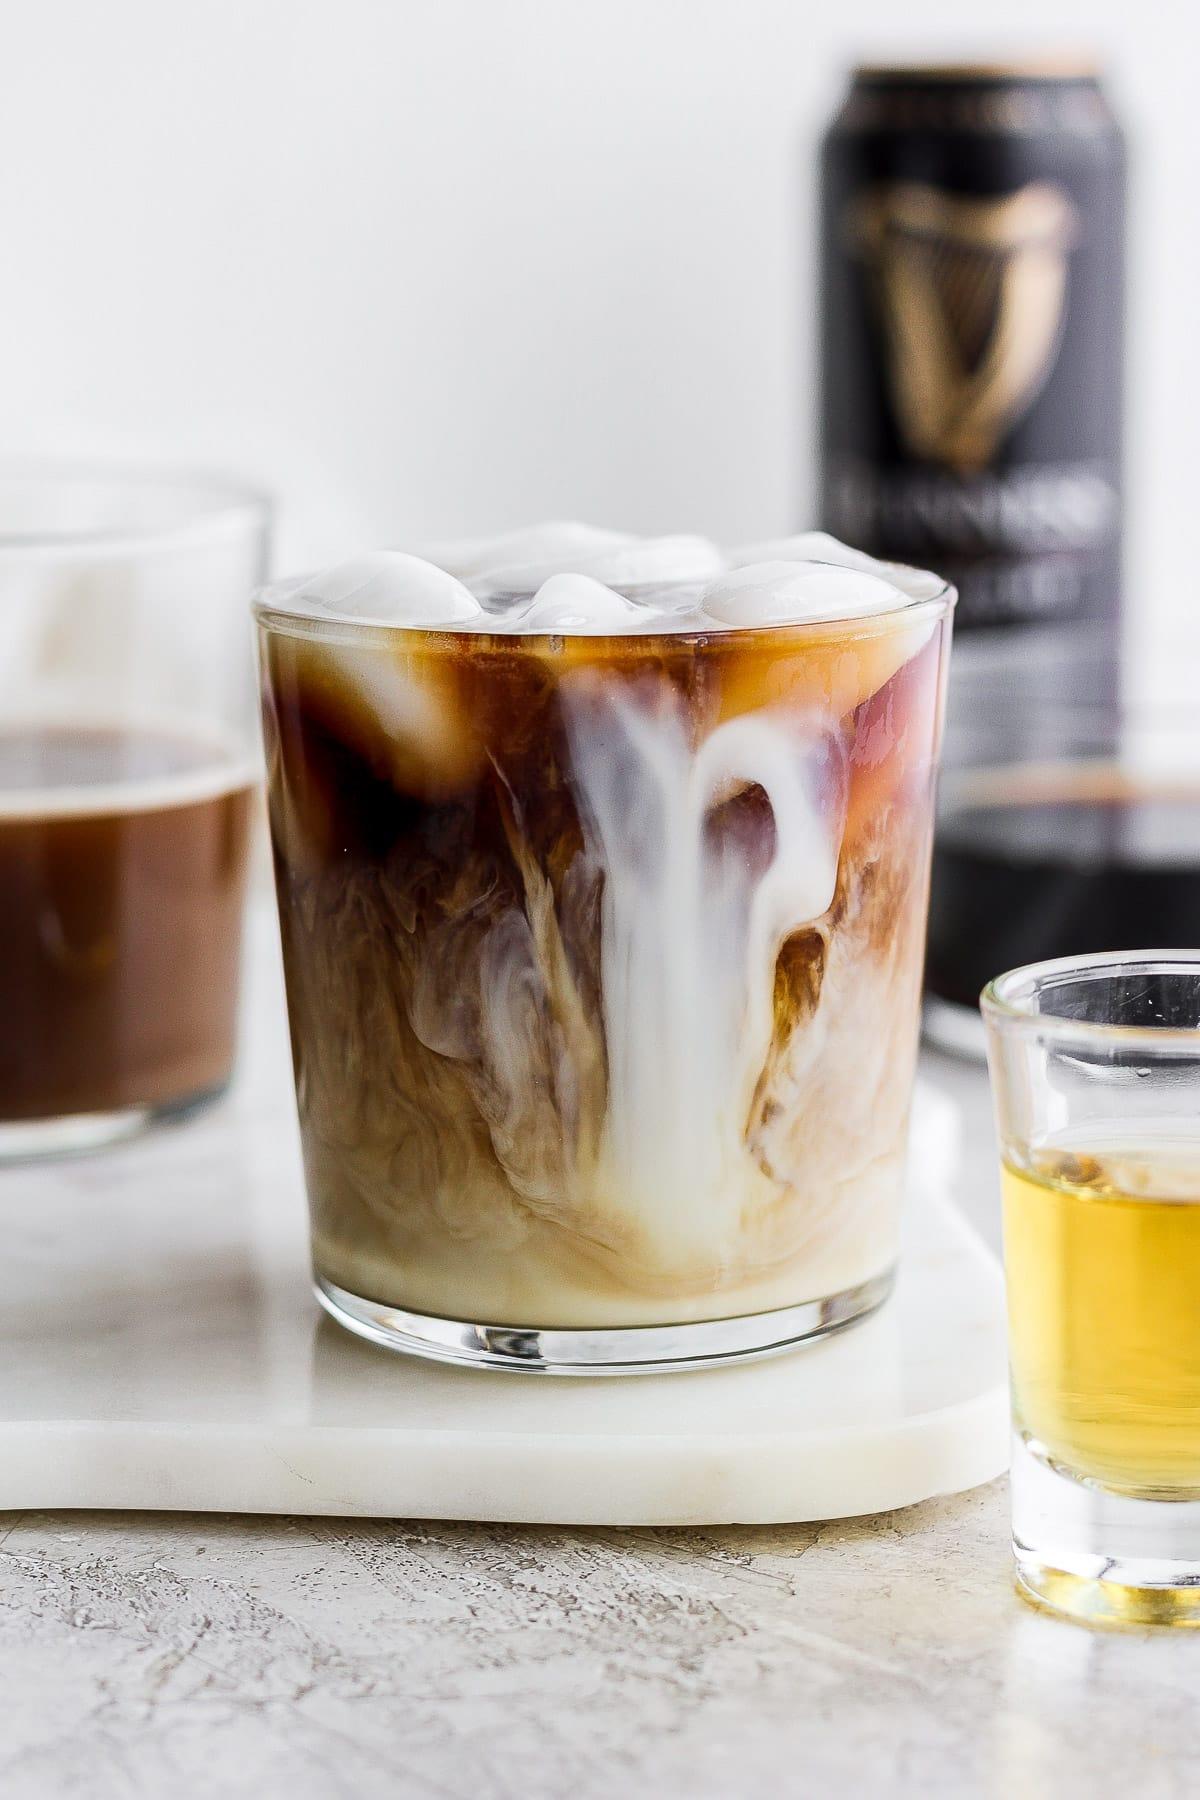 A glass of Irish Cold Brew Coffee.